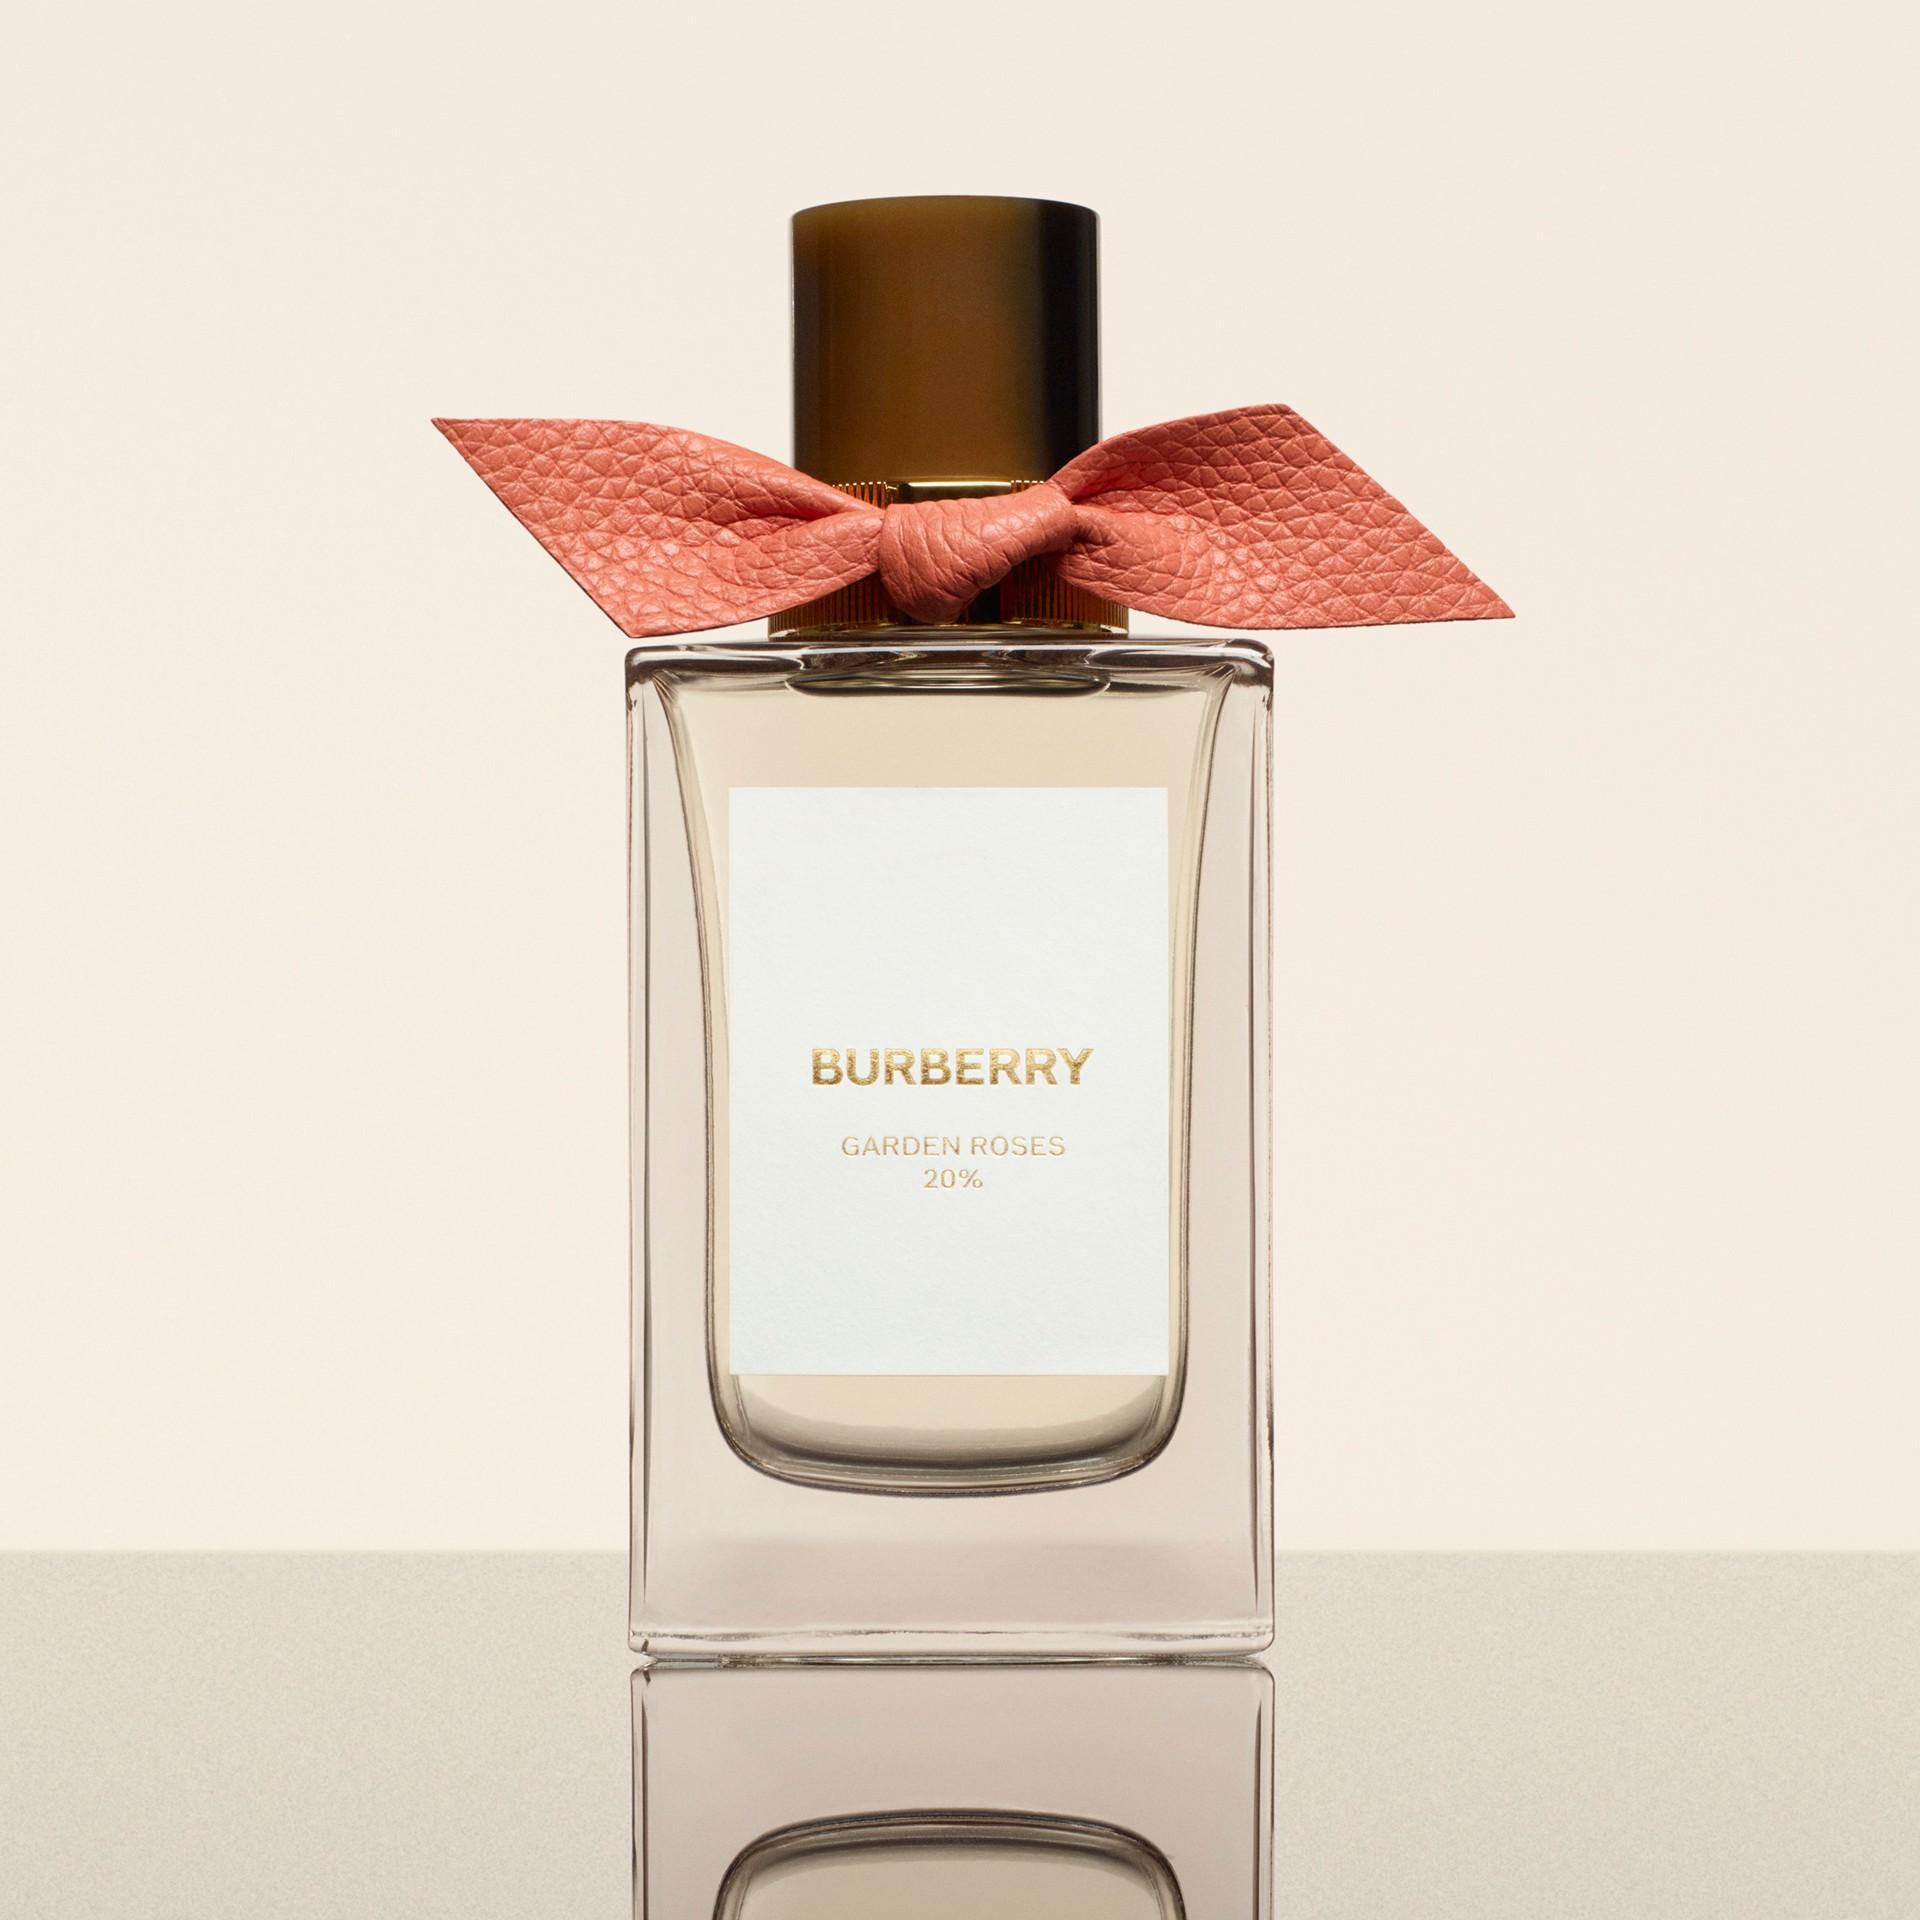 Burberry Signatures Garden Roses Eau de Parfum 100ml (100ml) | Burberry - Galerie-Bild 1